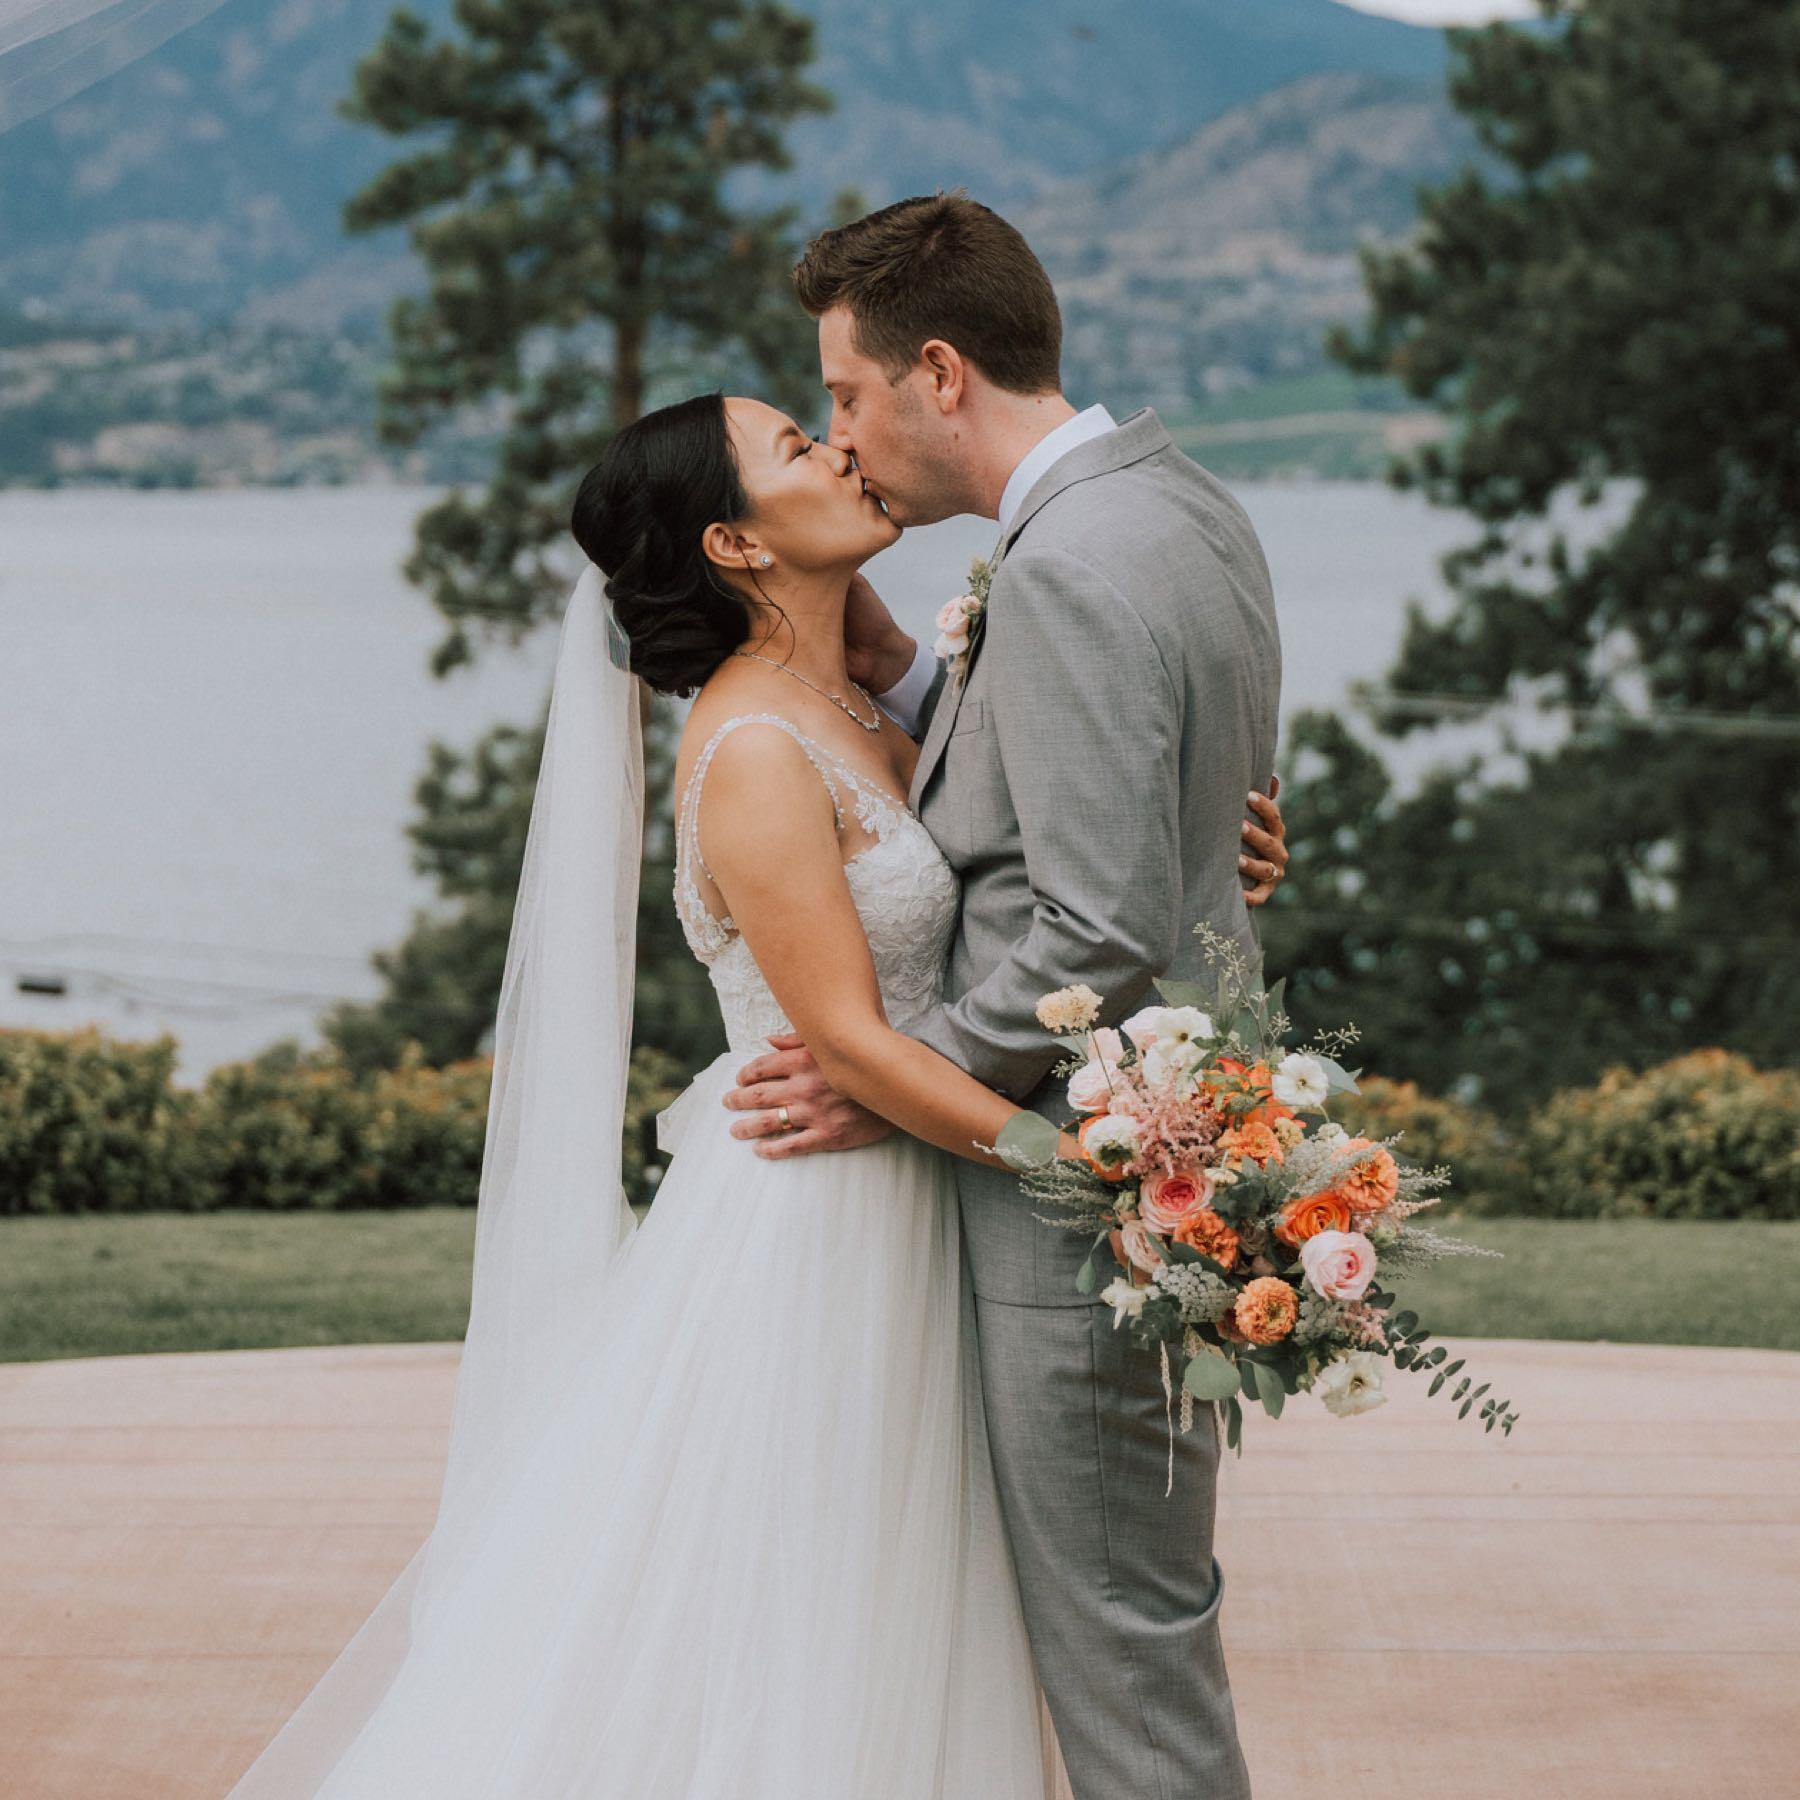 footer-wedding-image-6